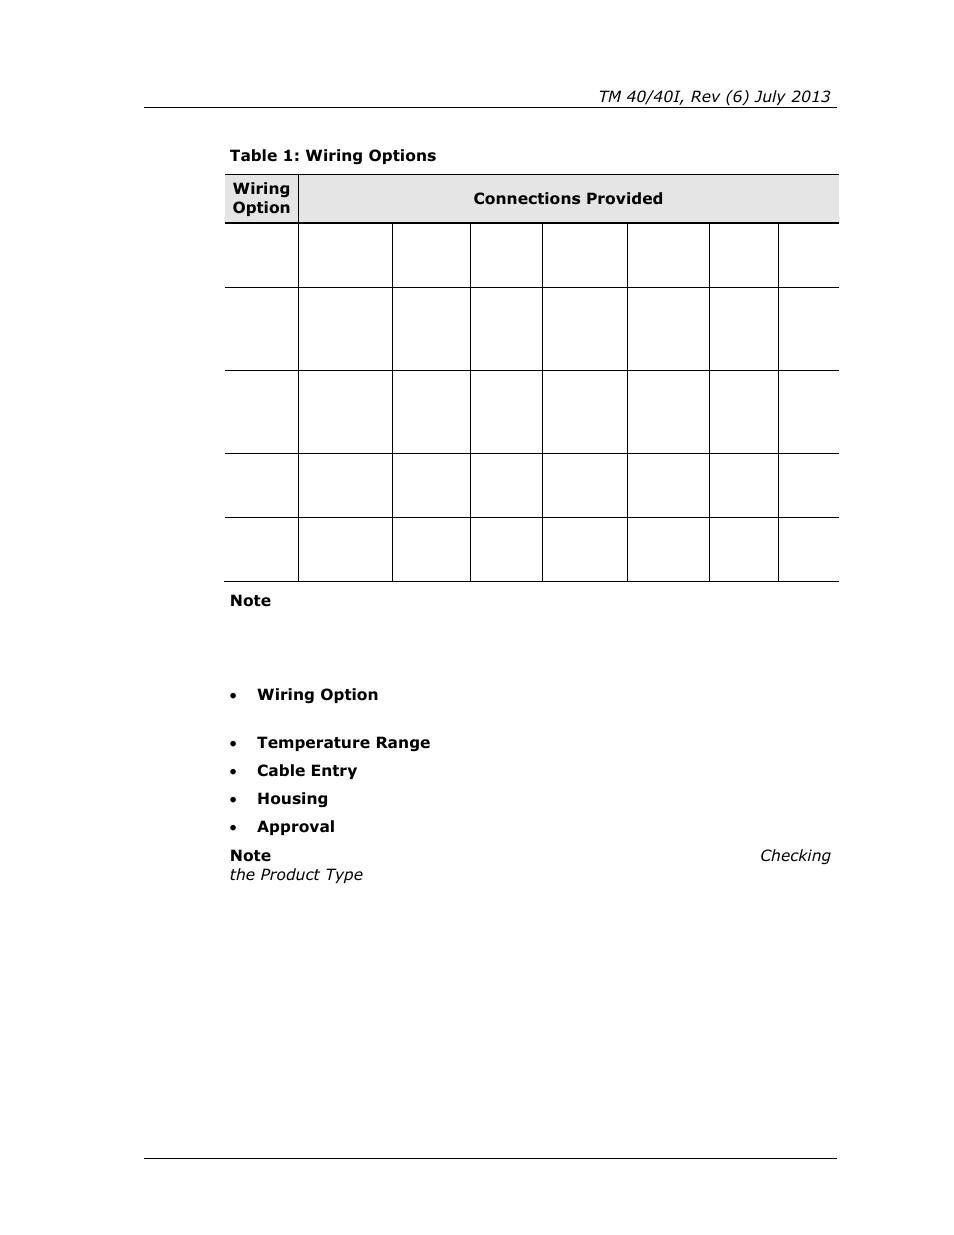 medium resolution of table 1 wiring options spectrex 40 40i triple ir ir3 flame